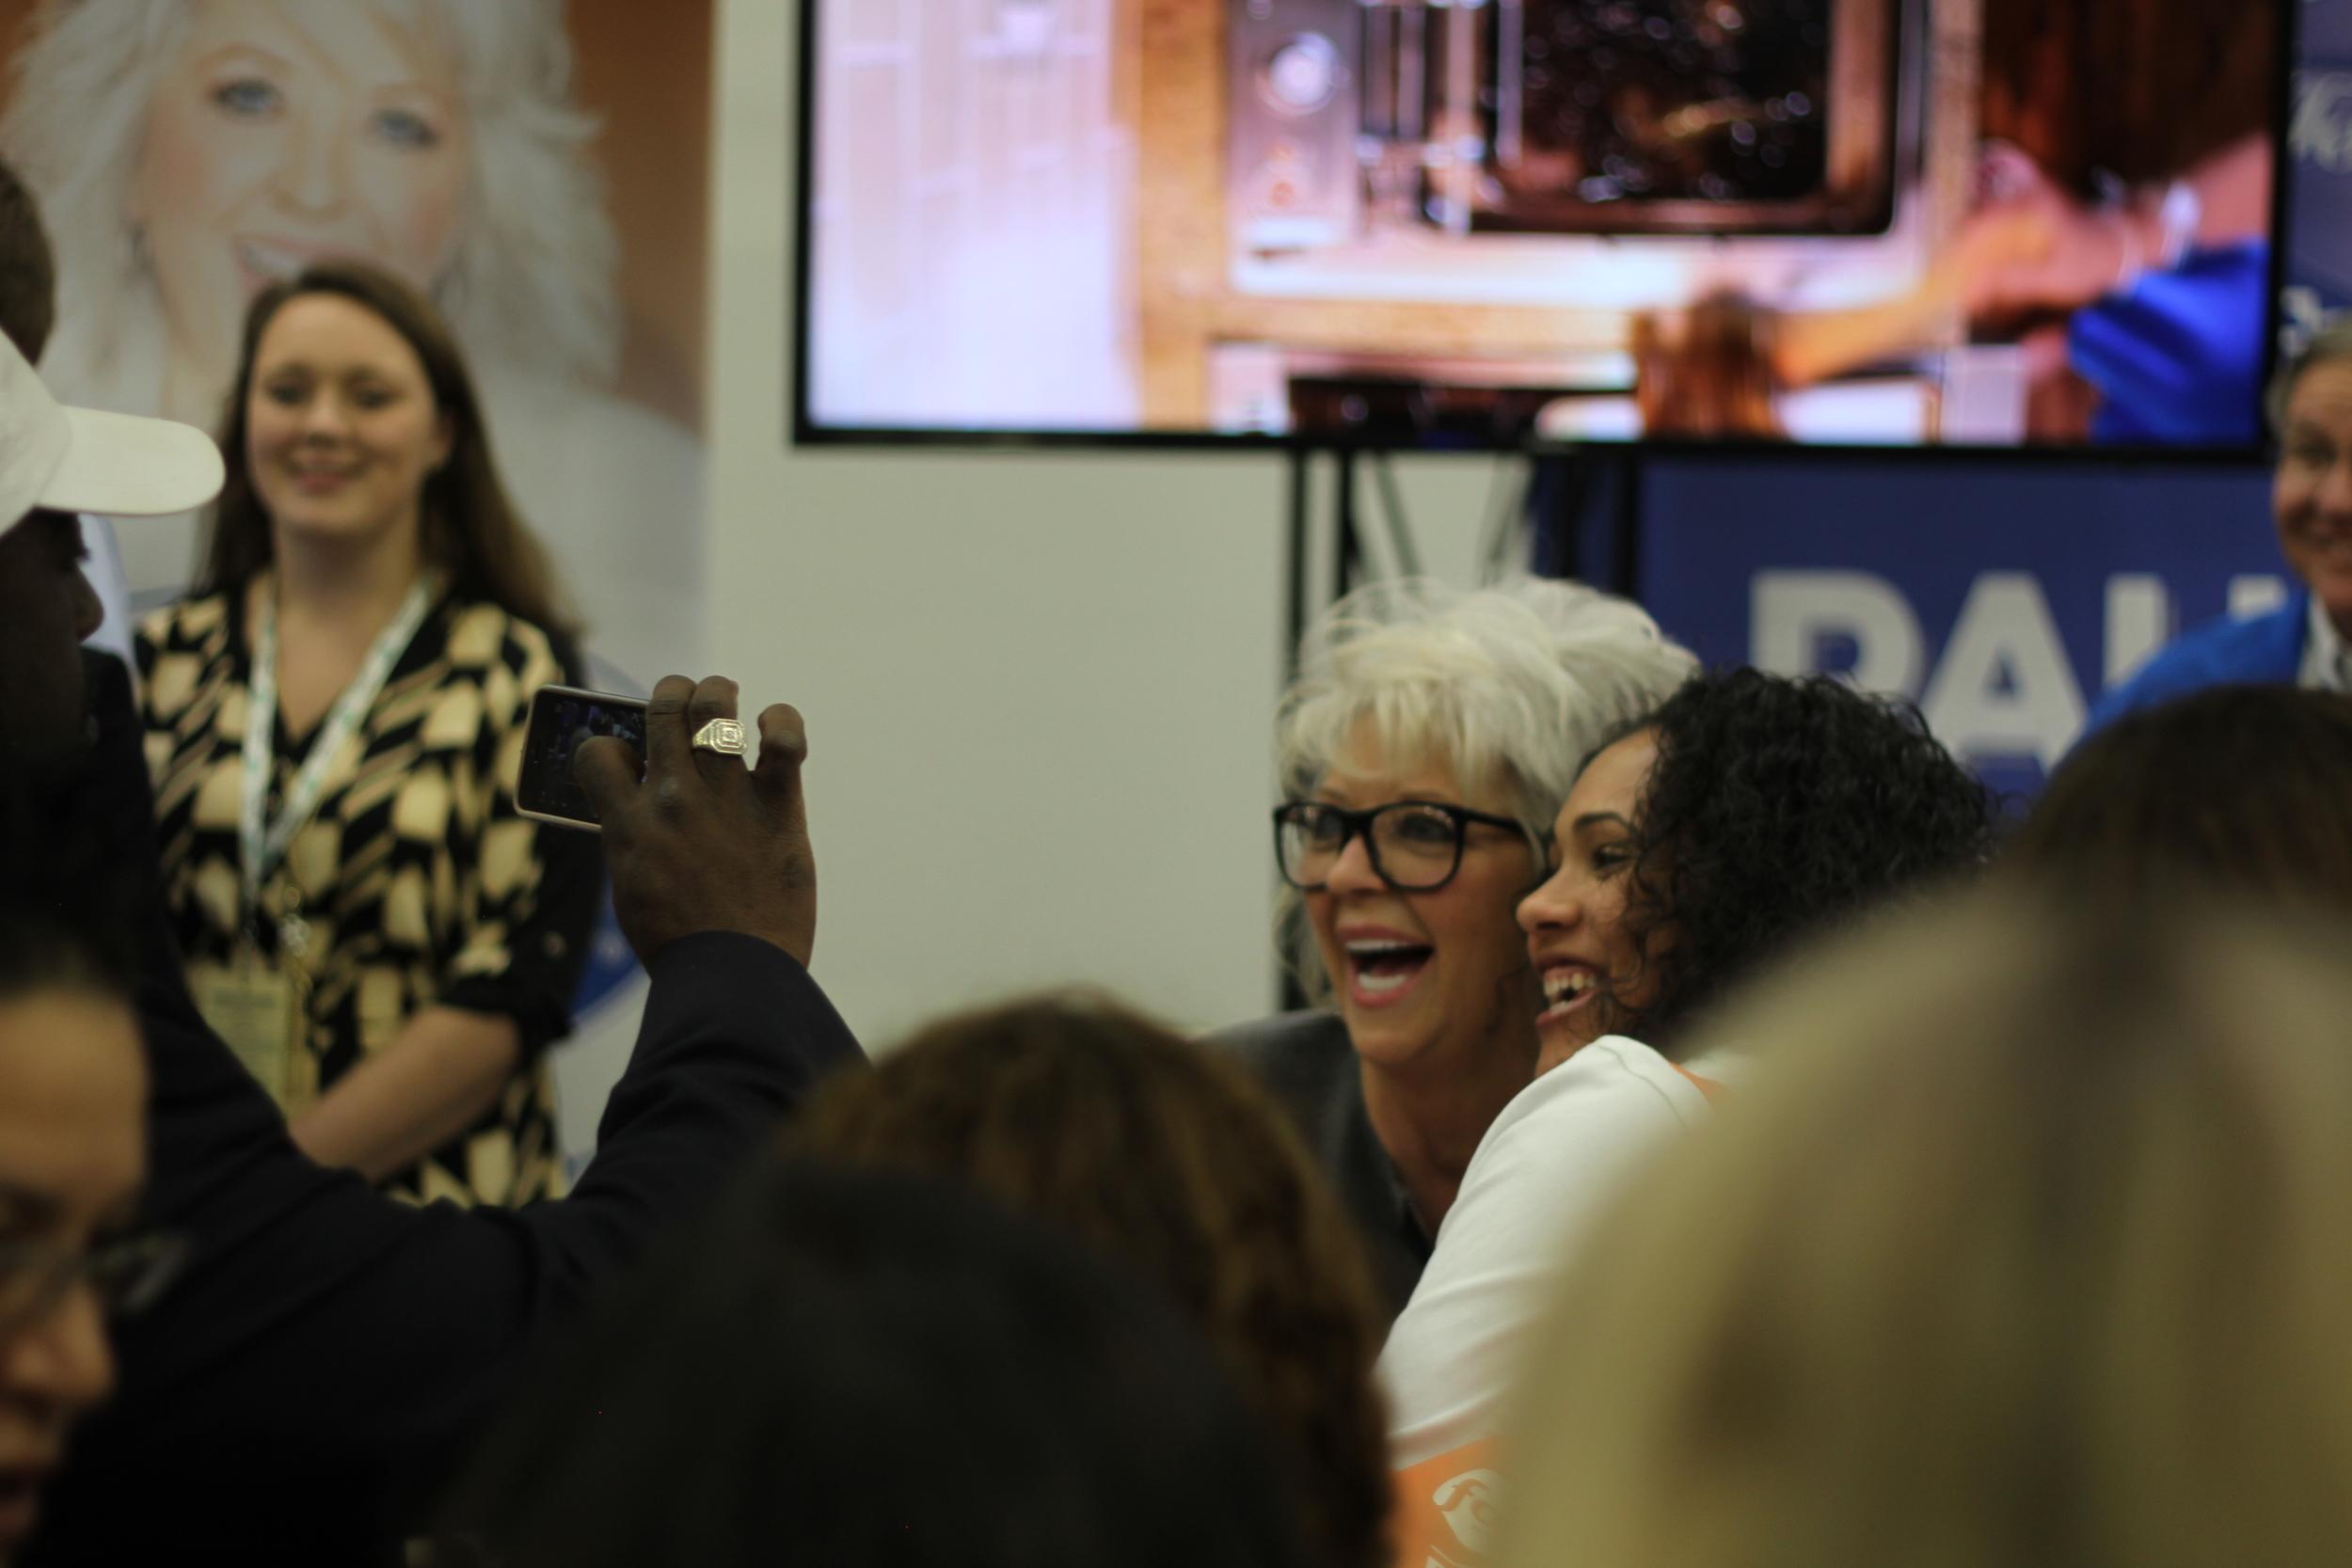 Paula Deen had the crowd going wild!